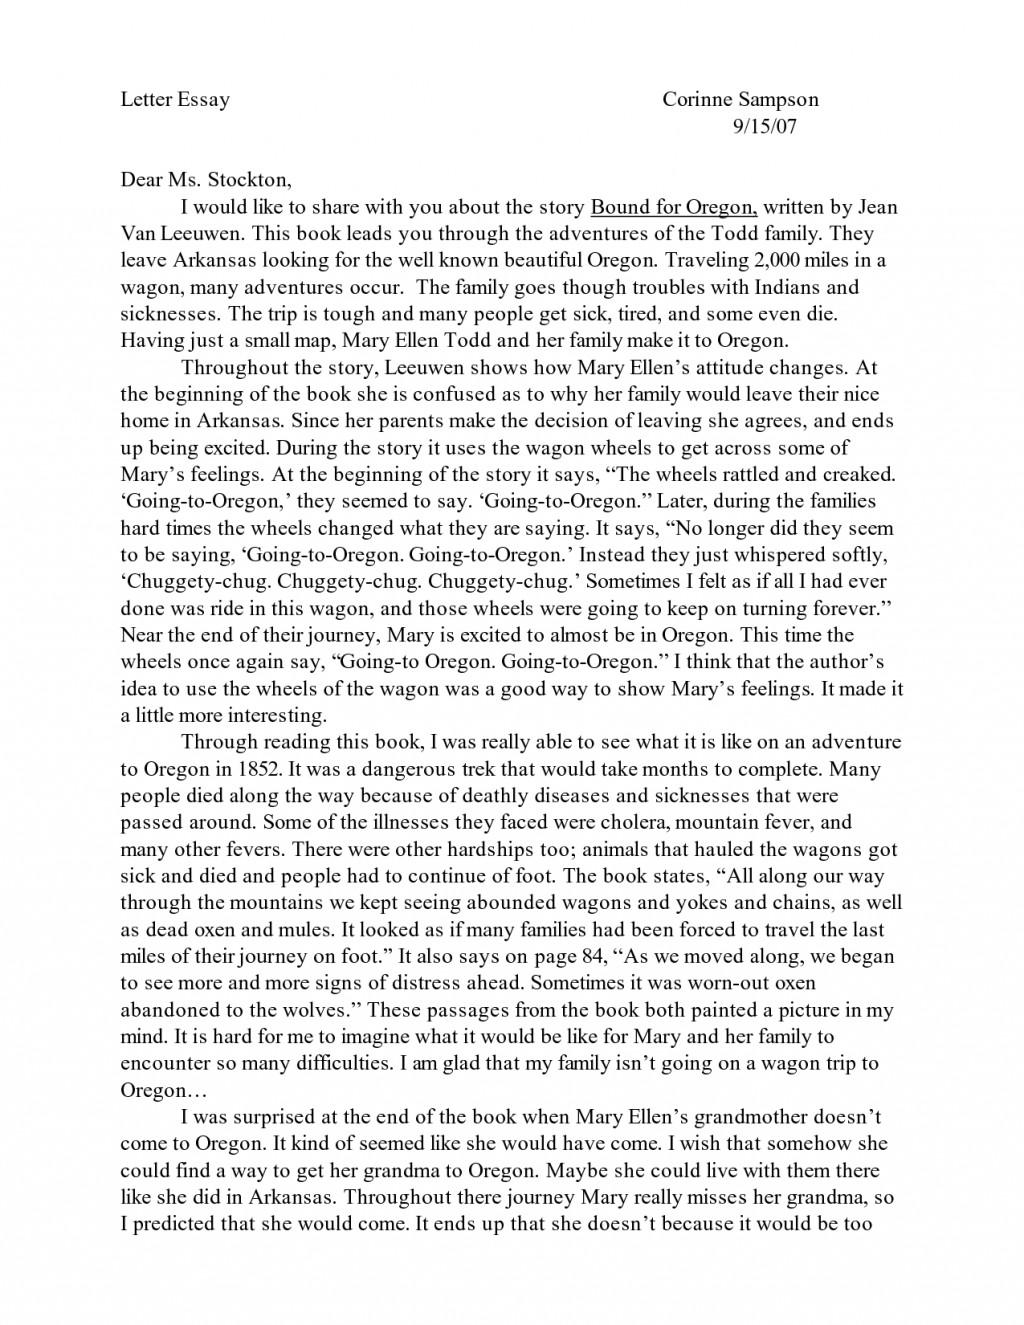 001 Essay Example Scholarship Sample Stunning Leadership For Mba Large